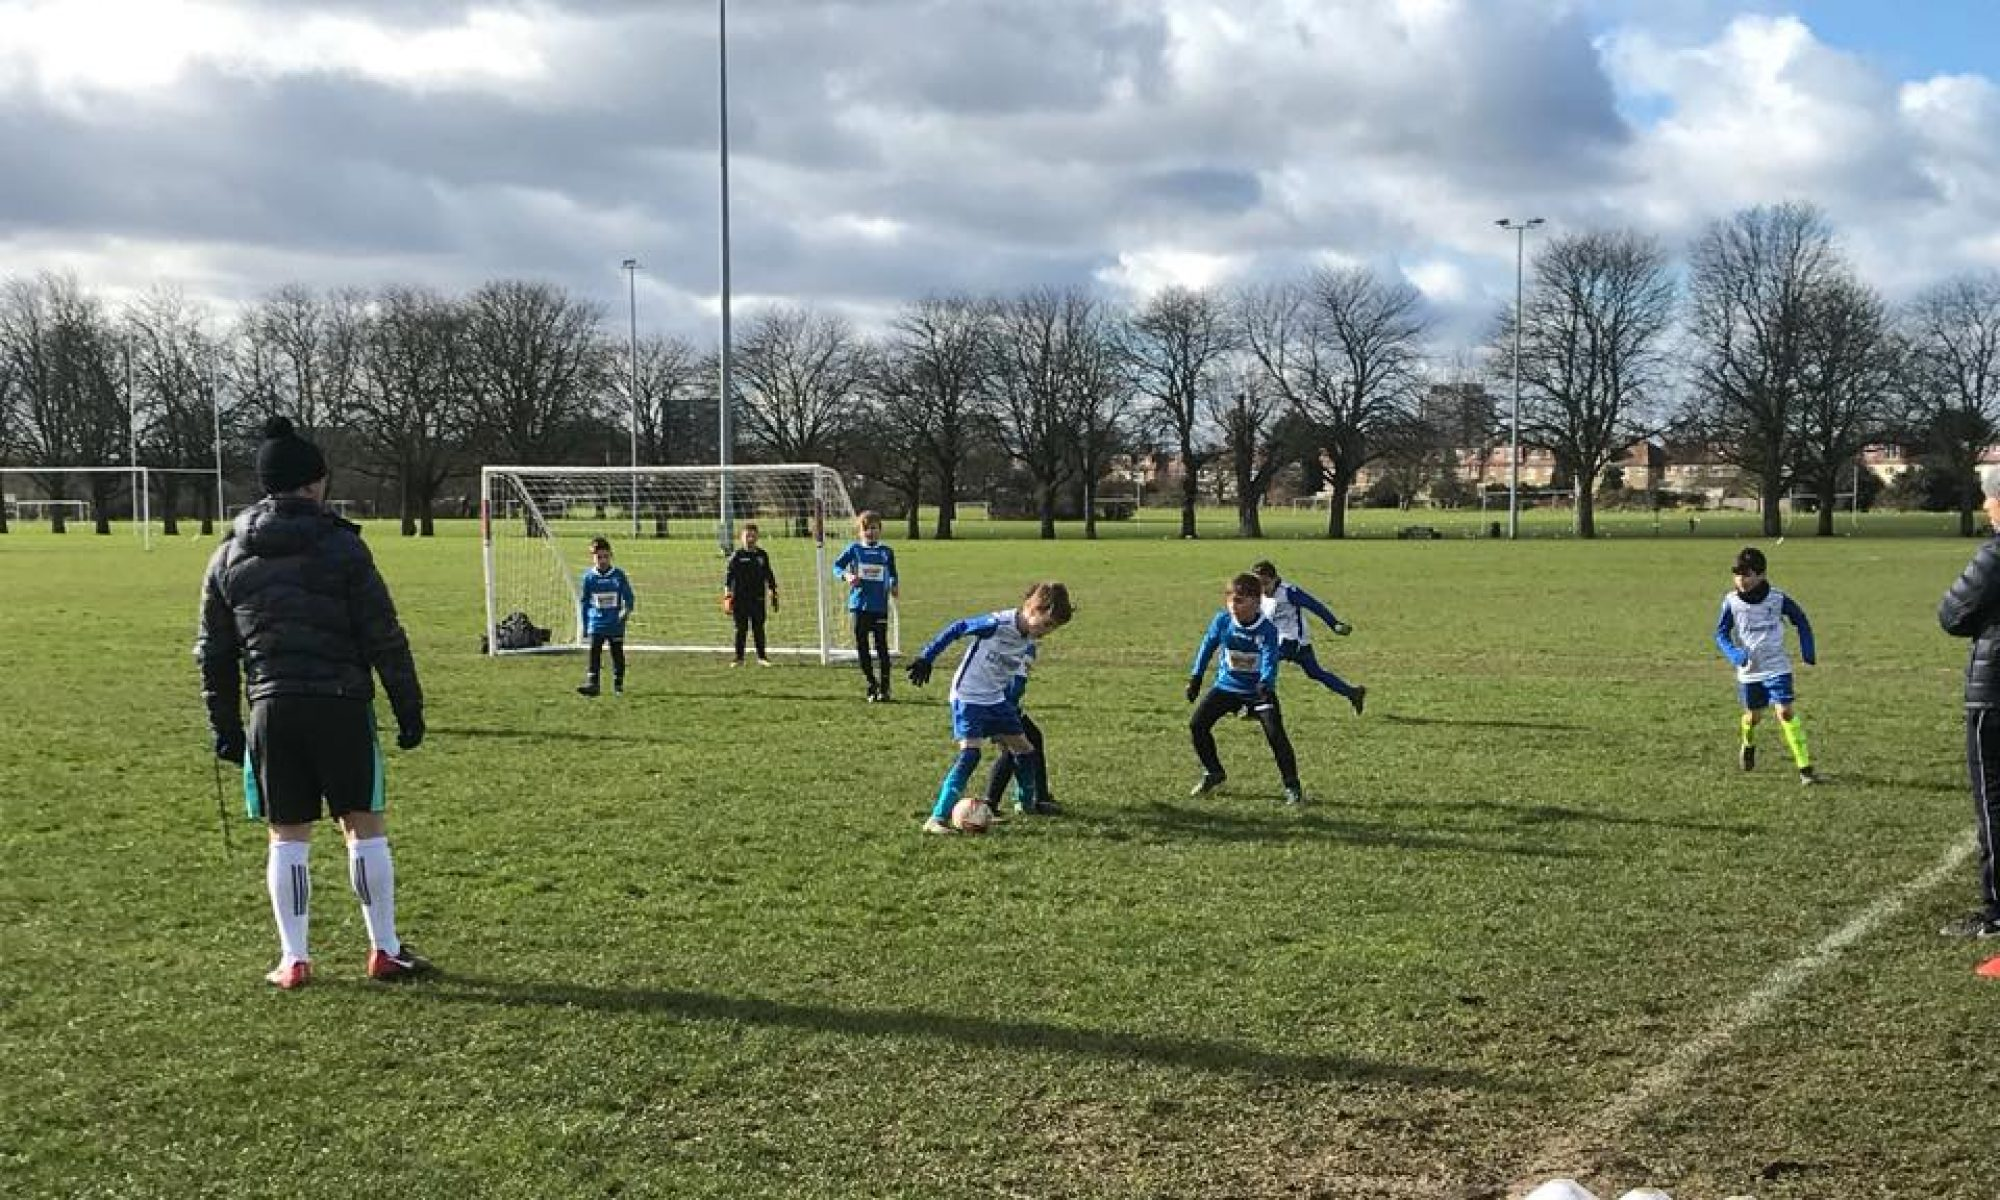 Enfield Town FC Community Sports Development Ltd